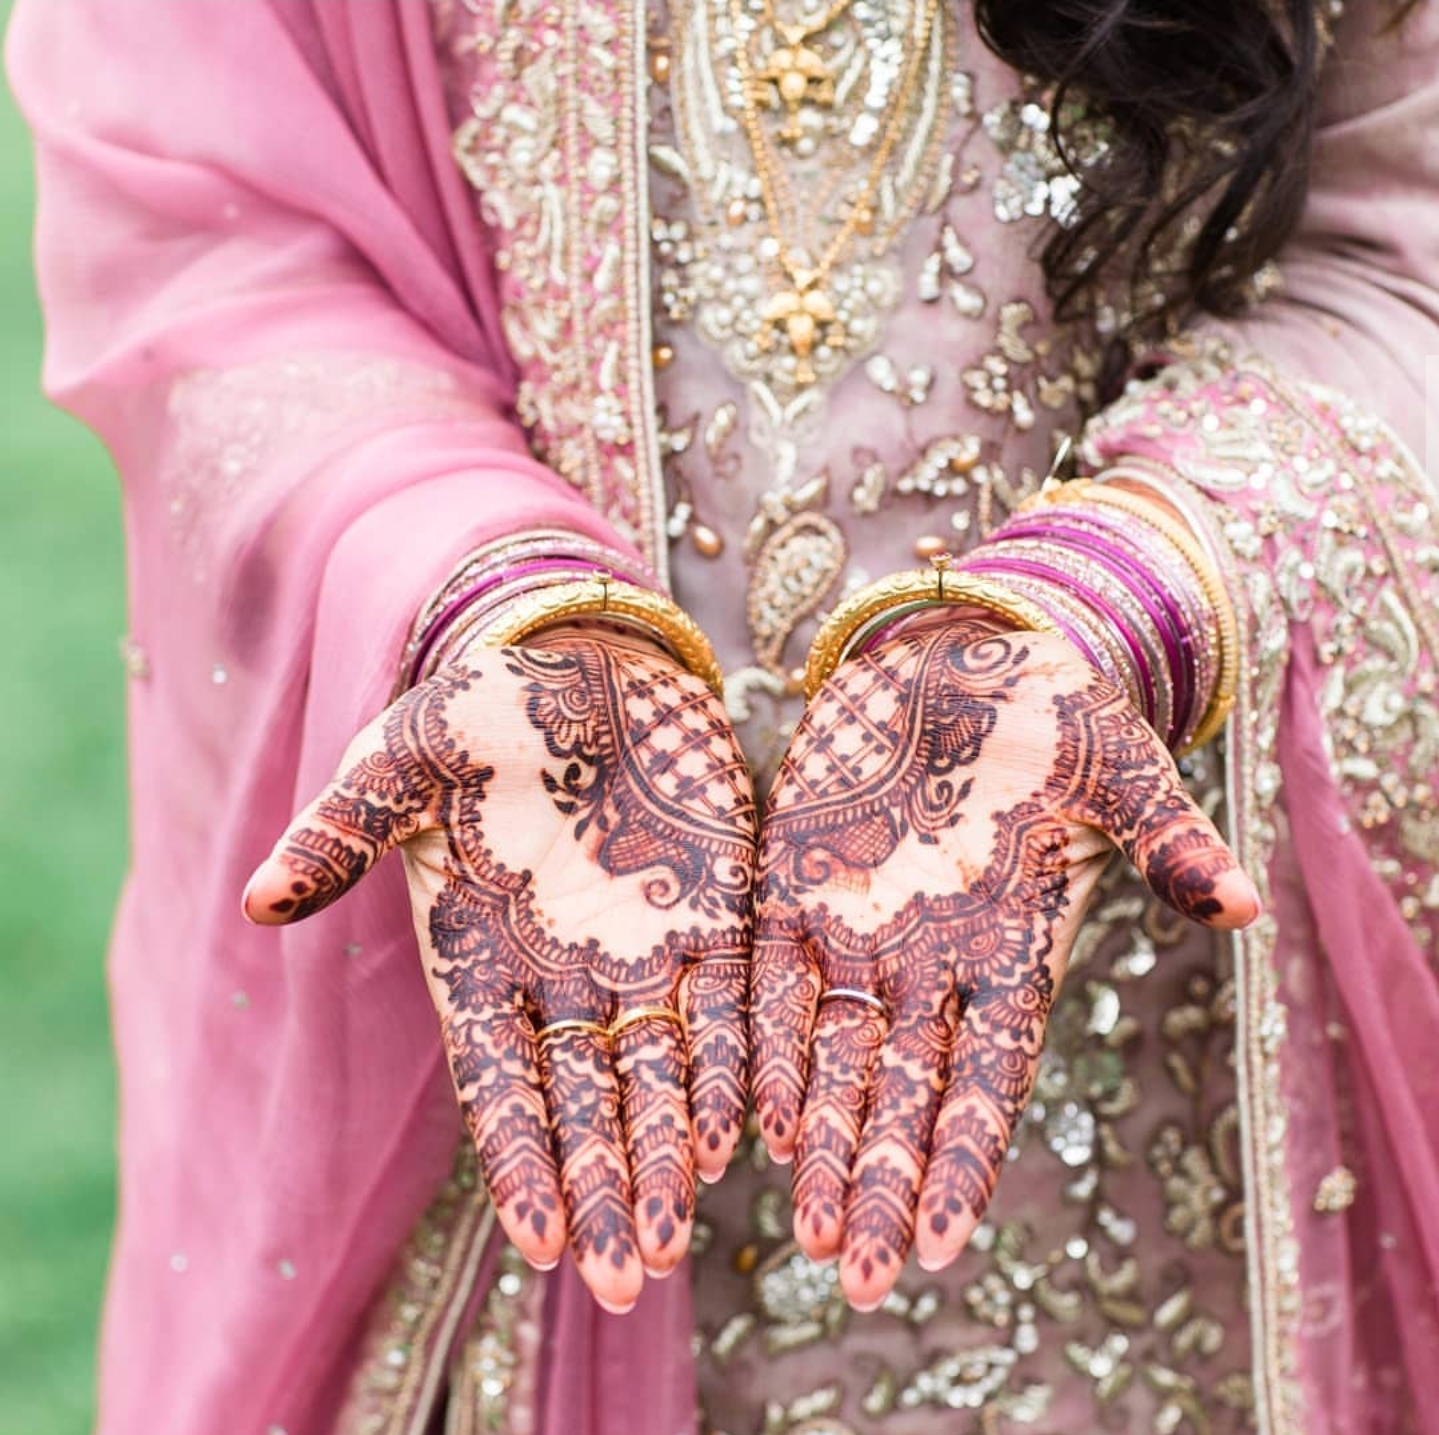 Hamnah N. The Henna Artist